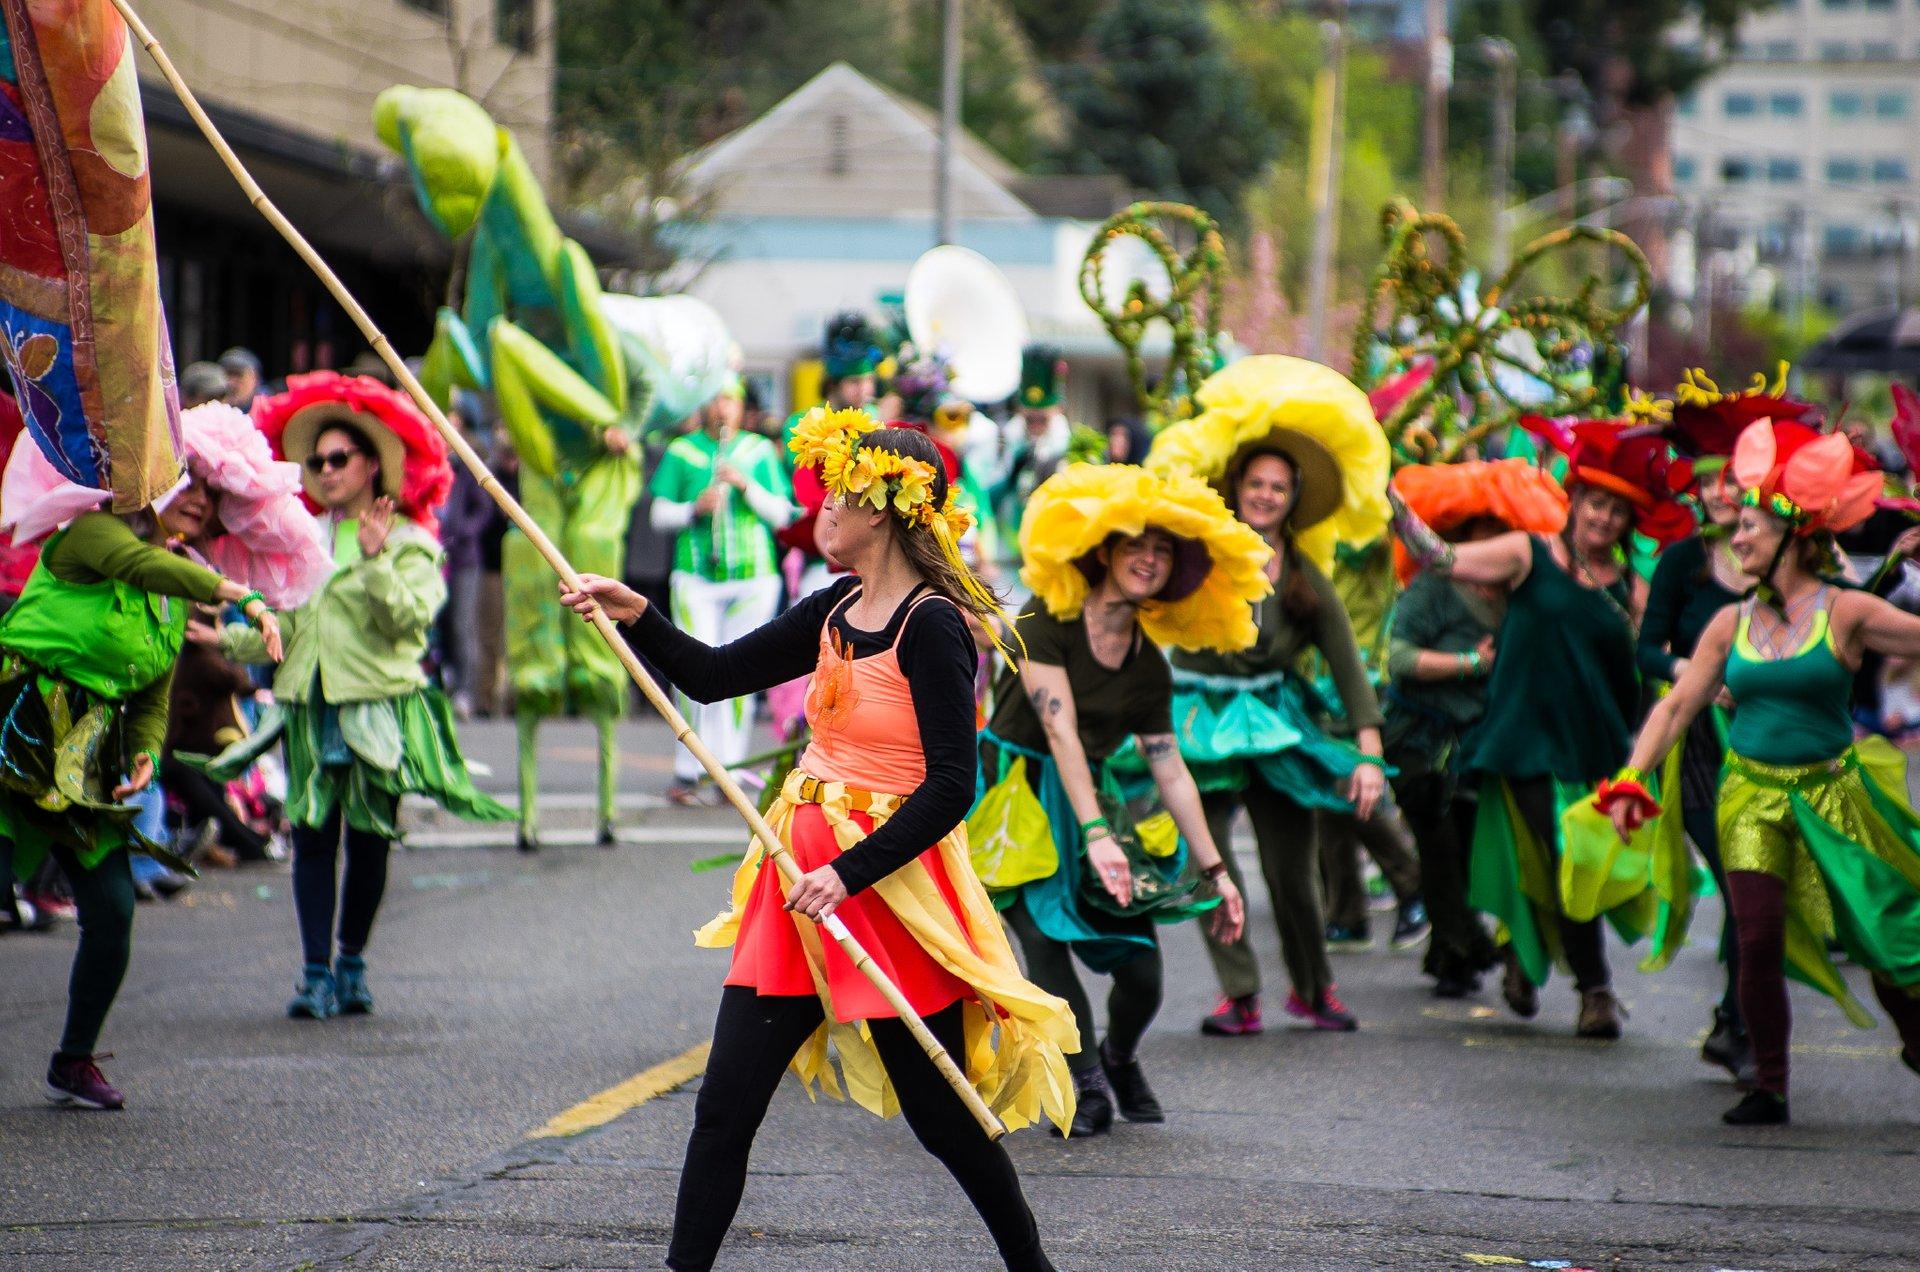 Olympia Arts Walk in Seattle 2019 - Best Time